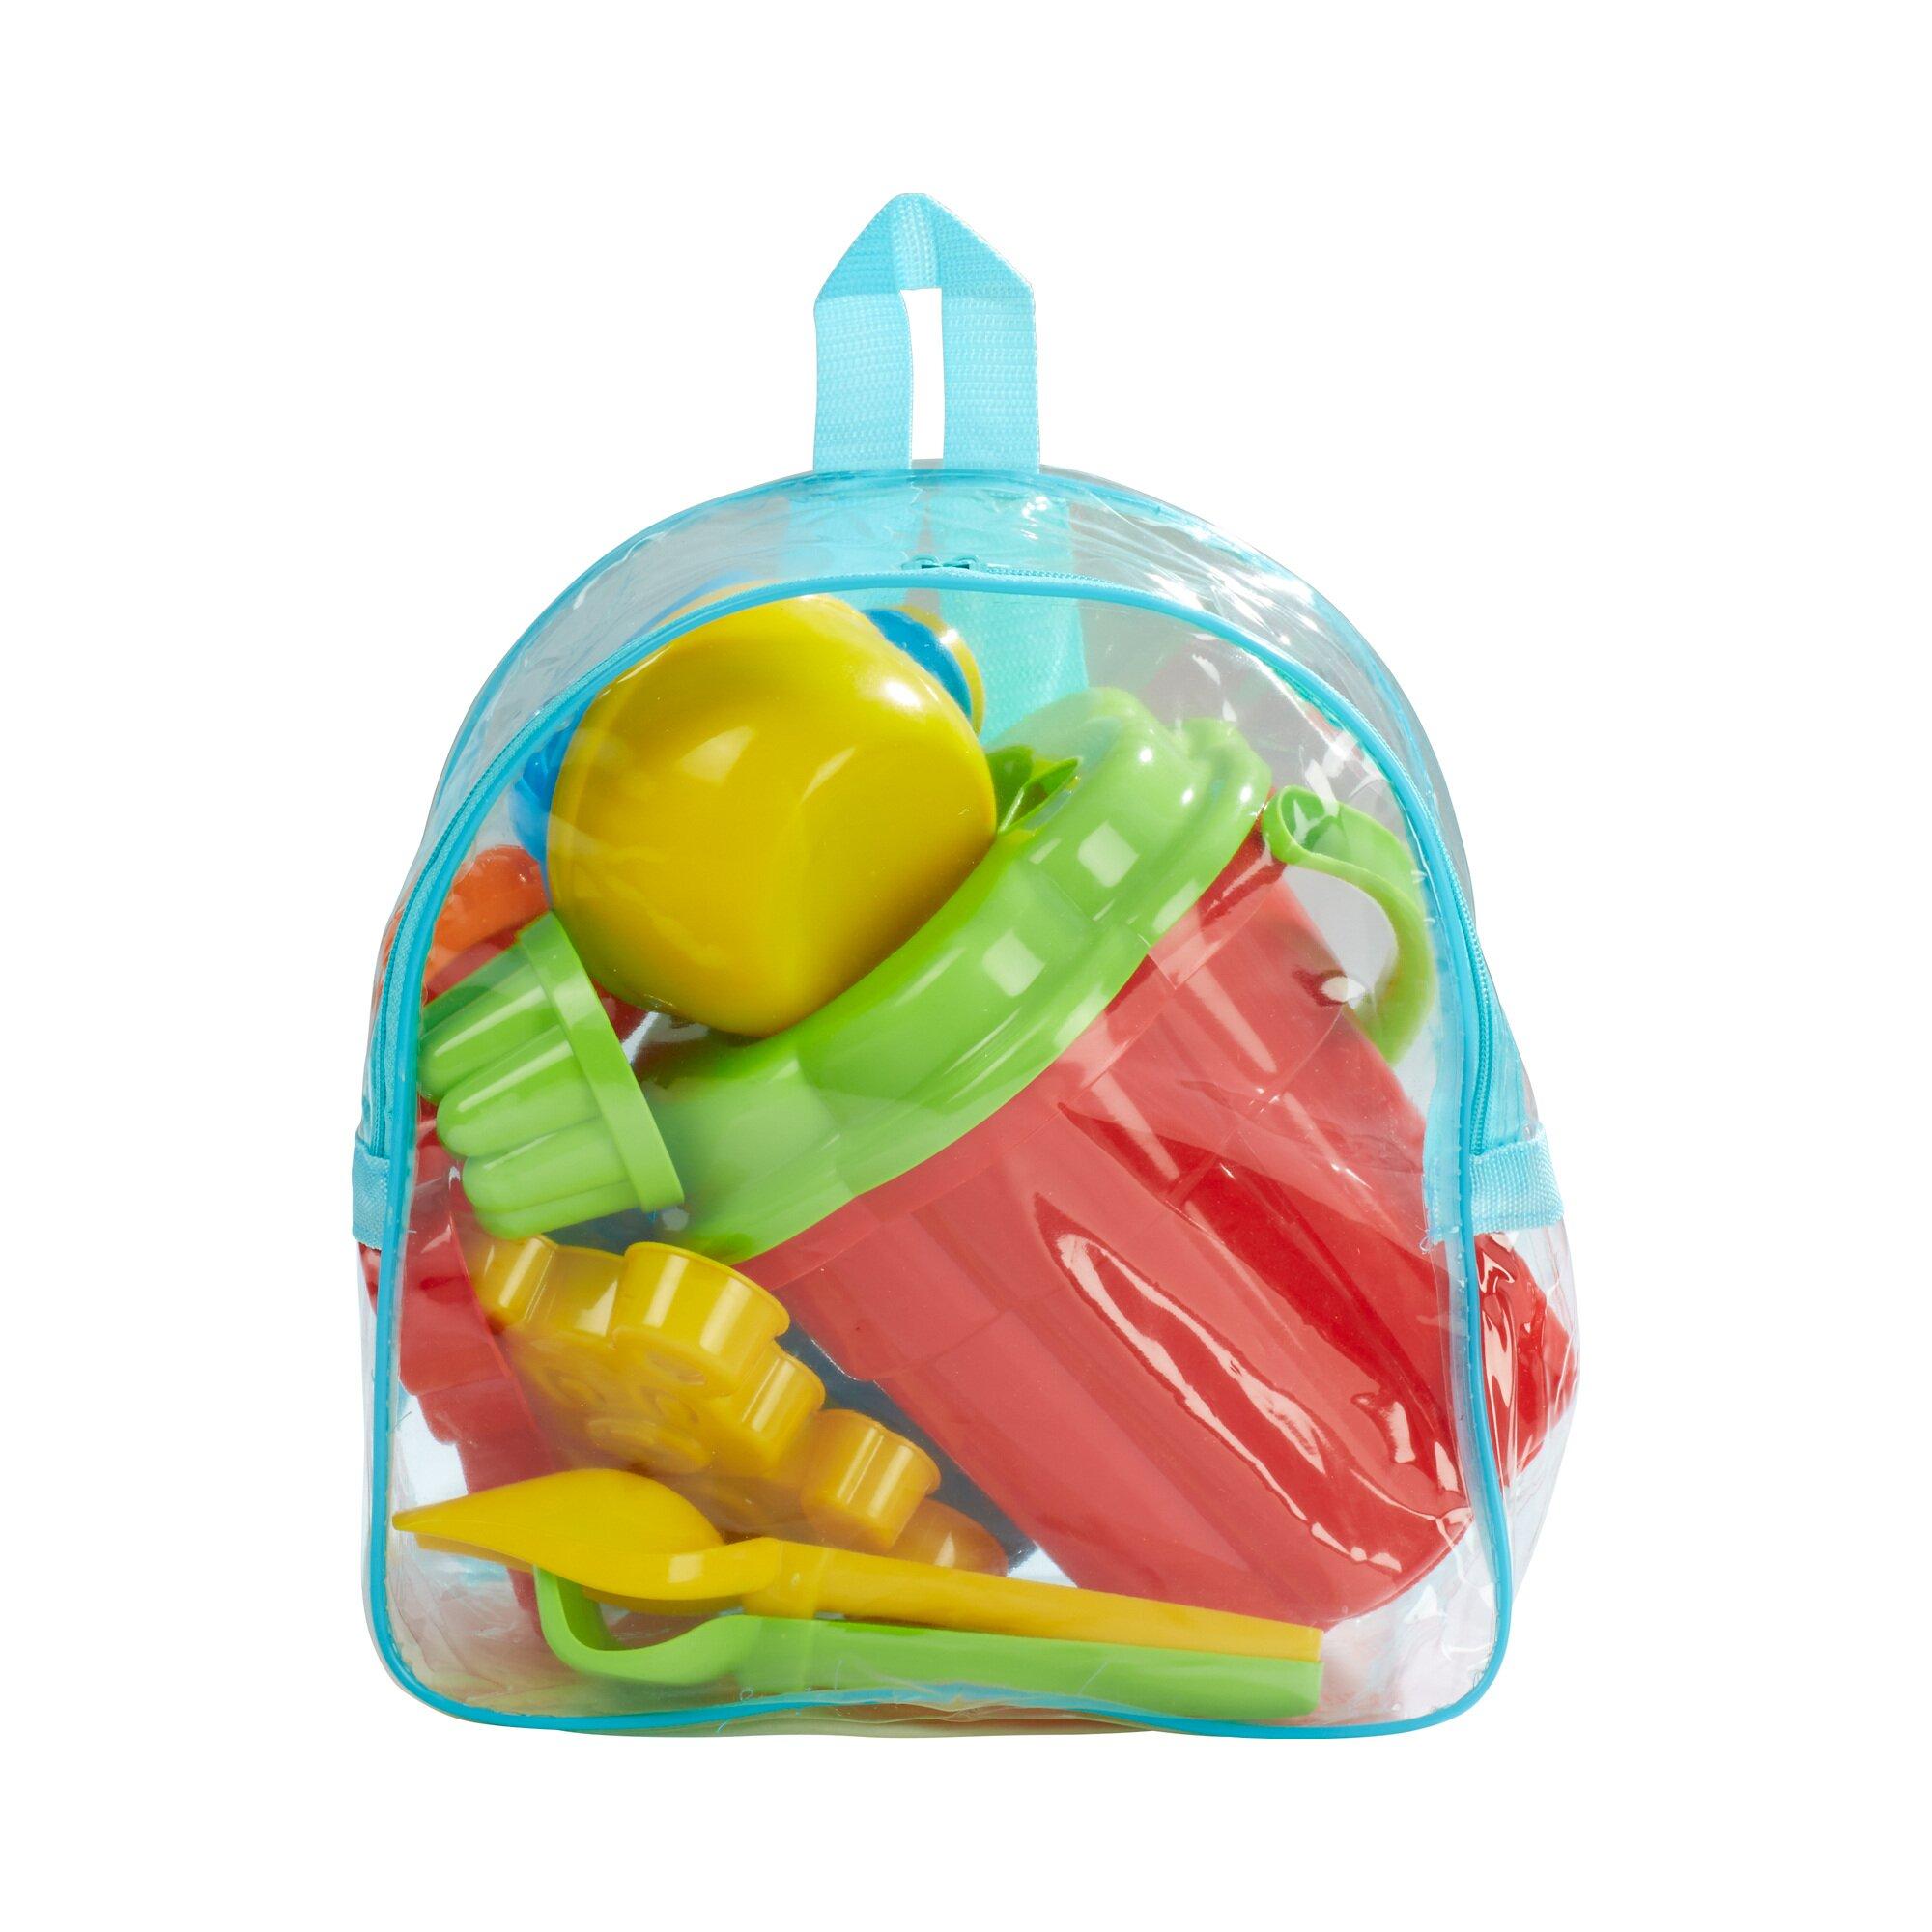 solini-12-tlg-sandspielzeug-set-mit-eimer-rucksack